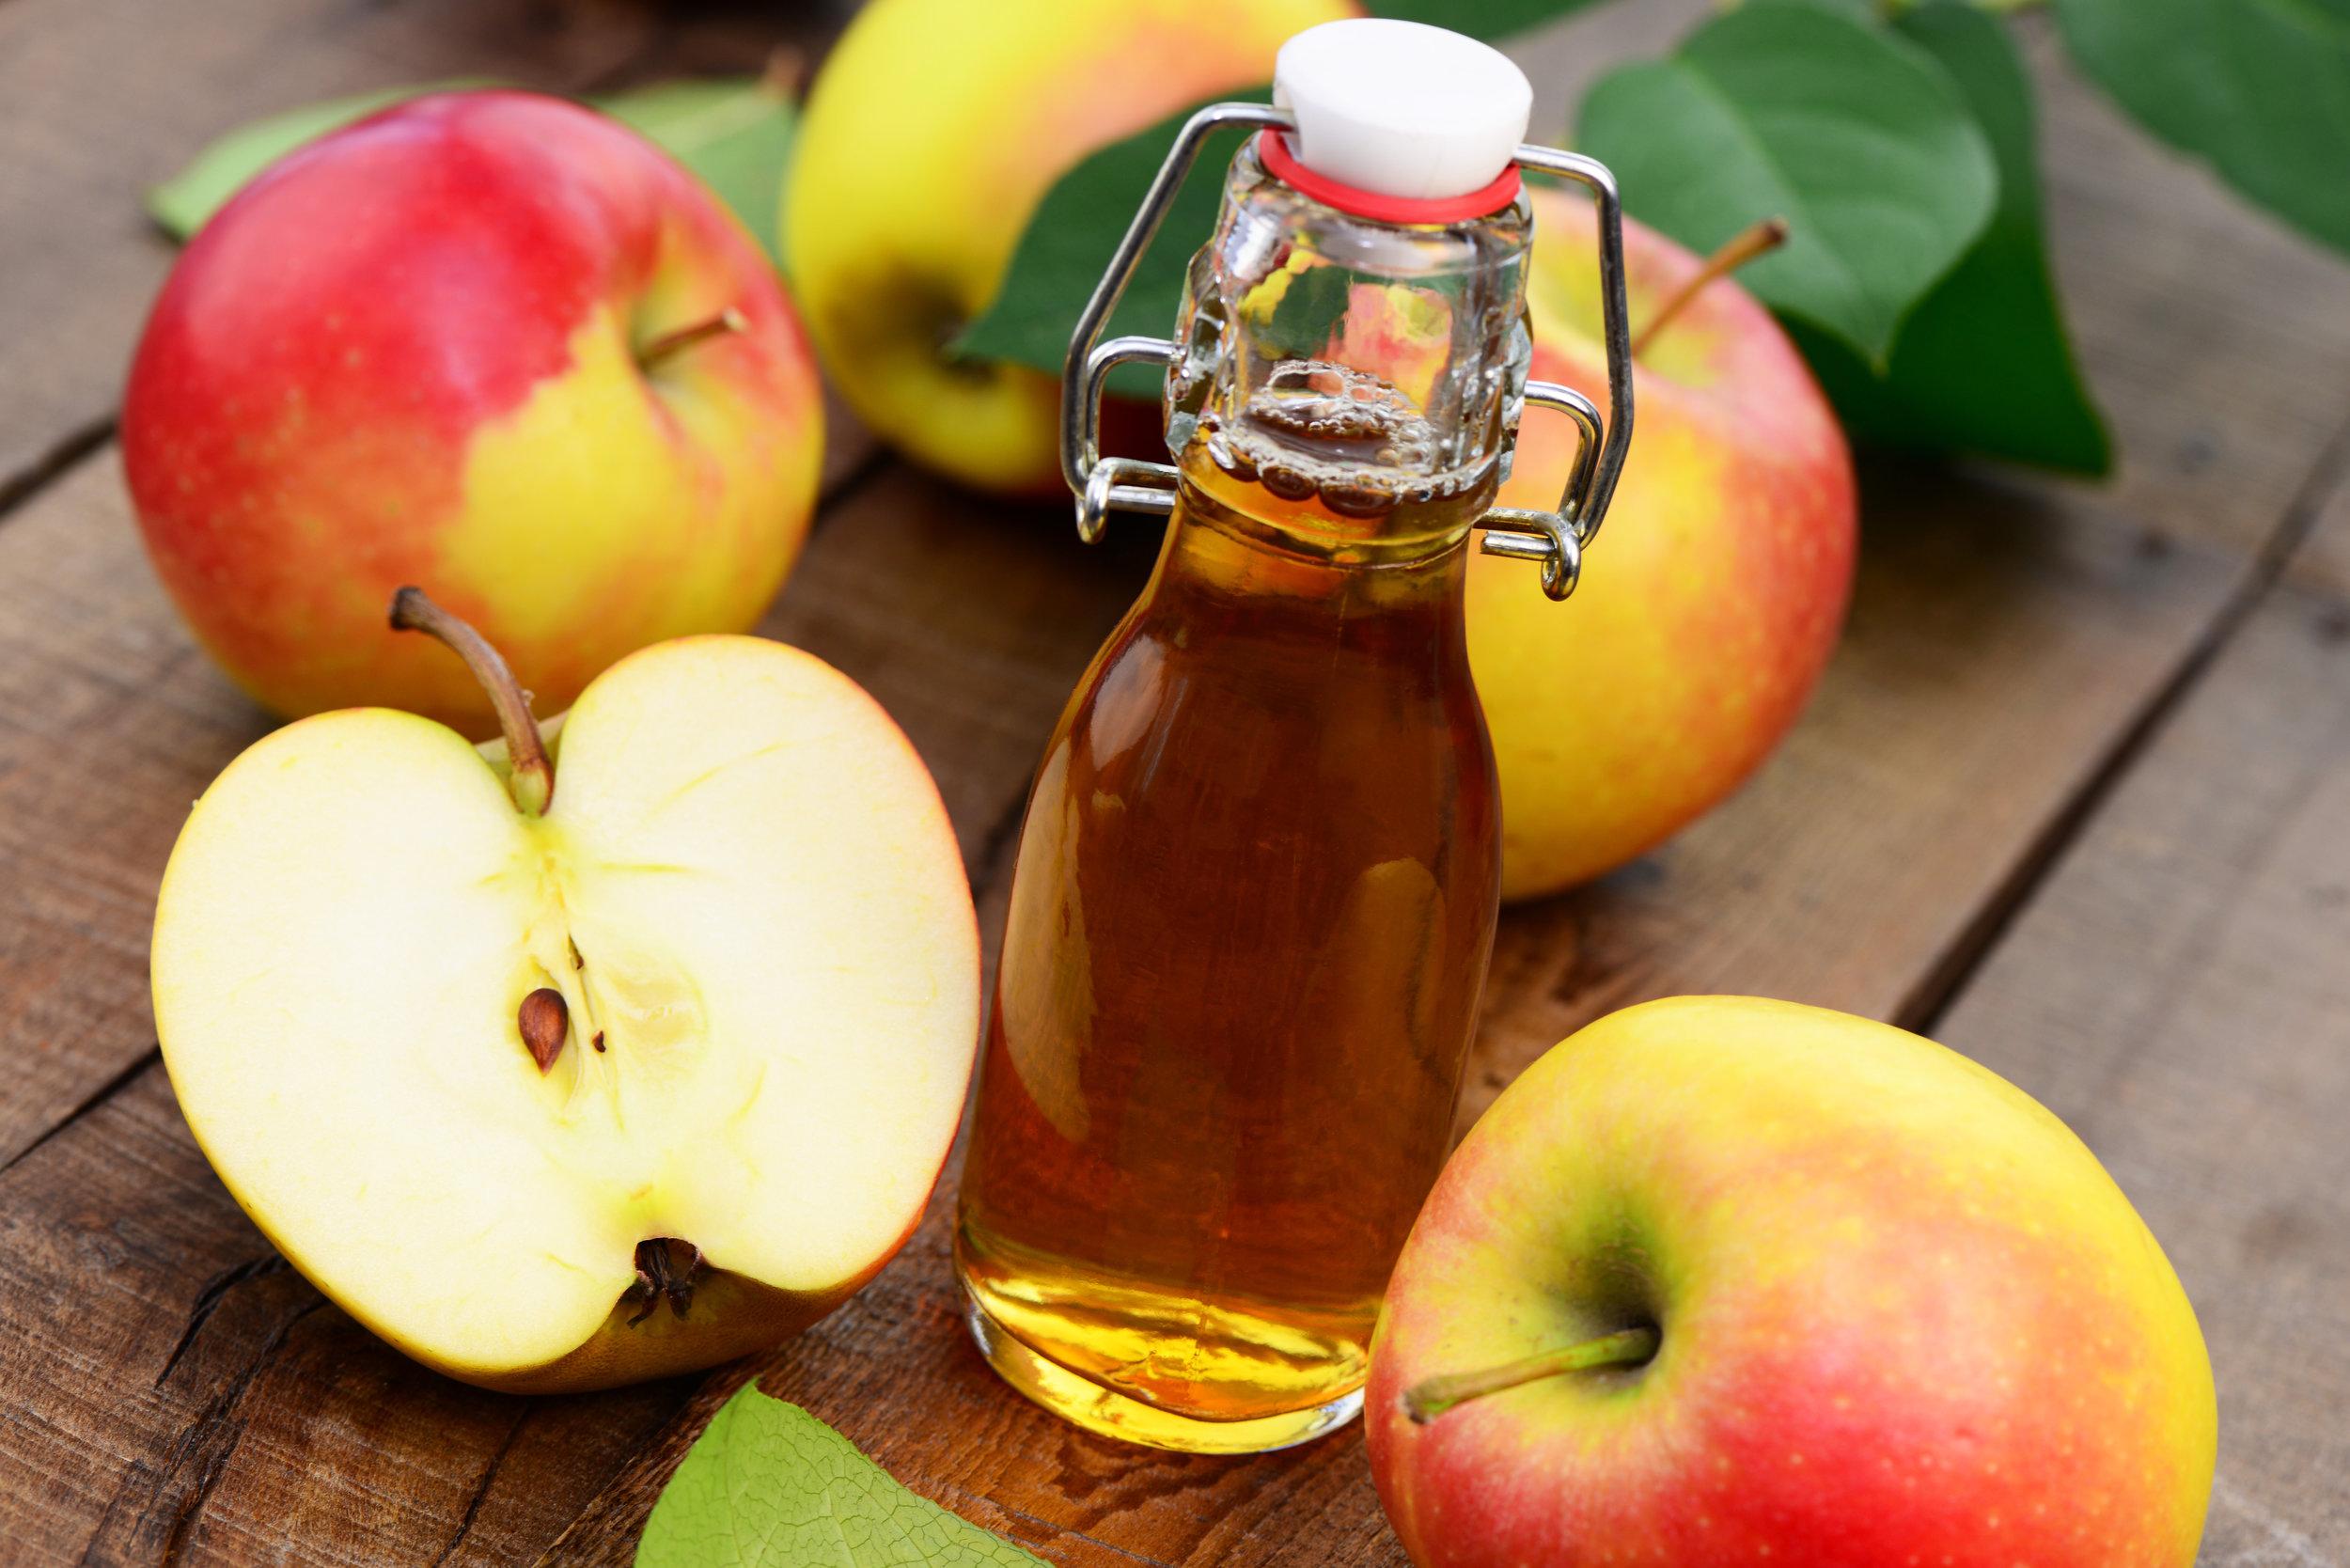 apple cider vinegar.jpg